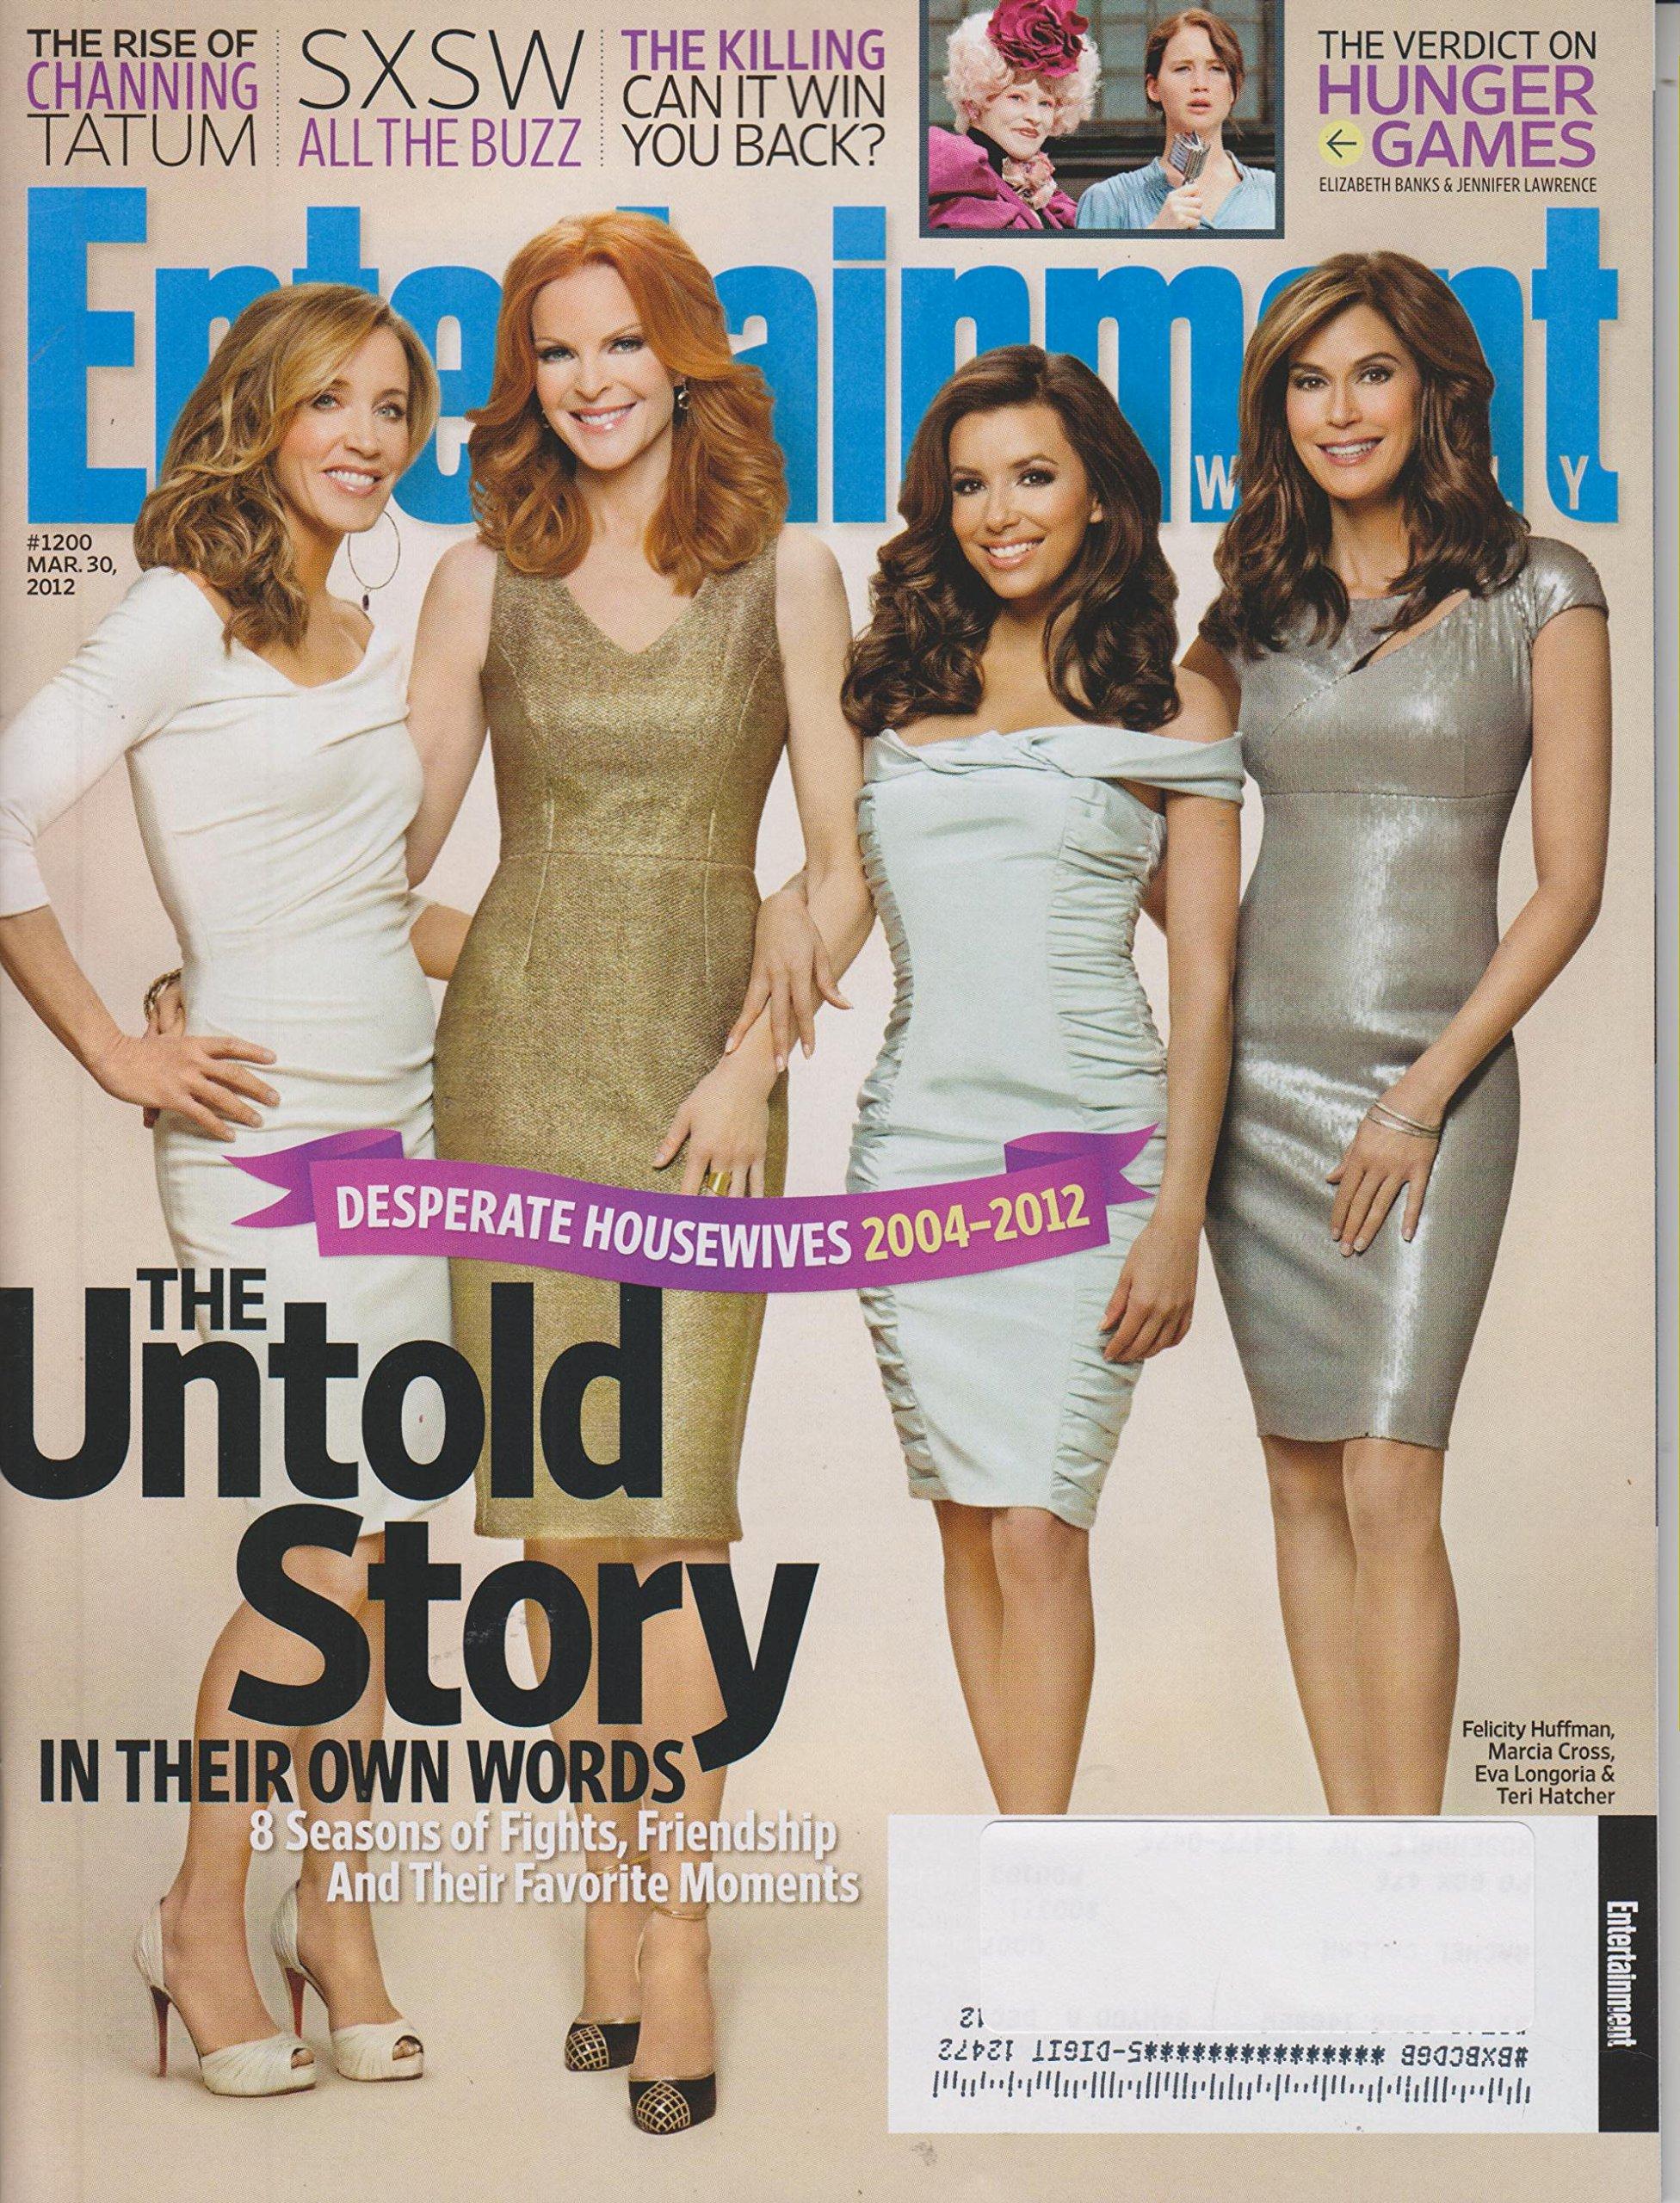 Read Online Entertainment Weekly March 30 2012 Felicity Huffman, Maria Cross, Eva Longoria & Teri Hatcher (Desperate Housewives The Untold Story) pdf epub